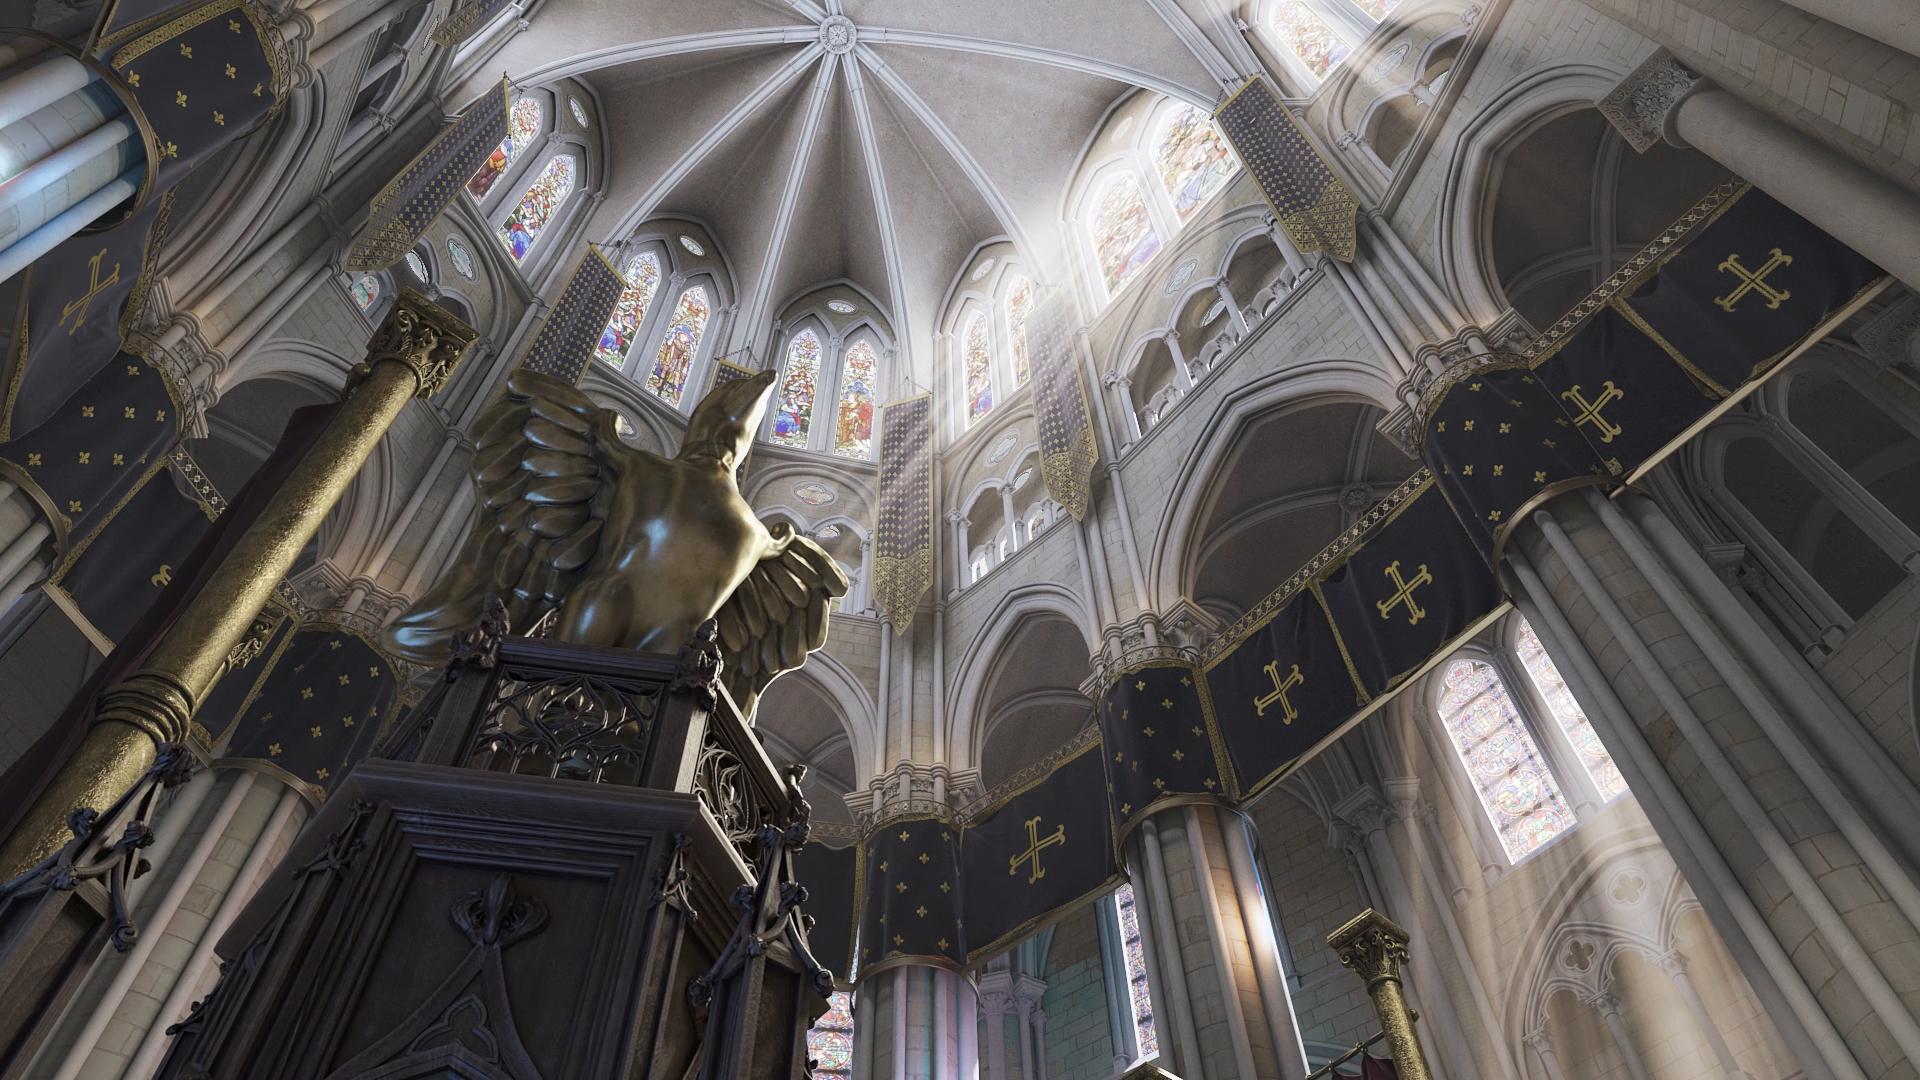 GALERIE-Dripmoon-Studio 3D-Tours-Reconstitution-Patrimoine-REVIS MARTIN (30) copie